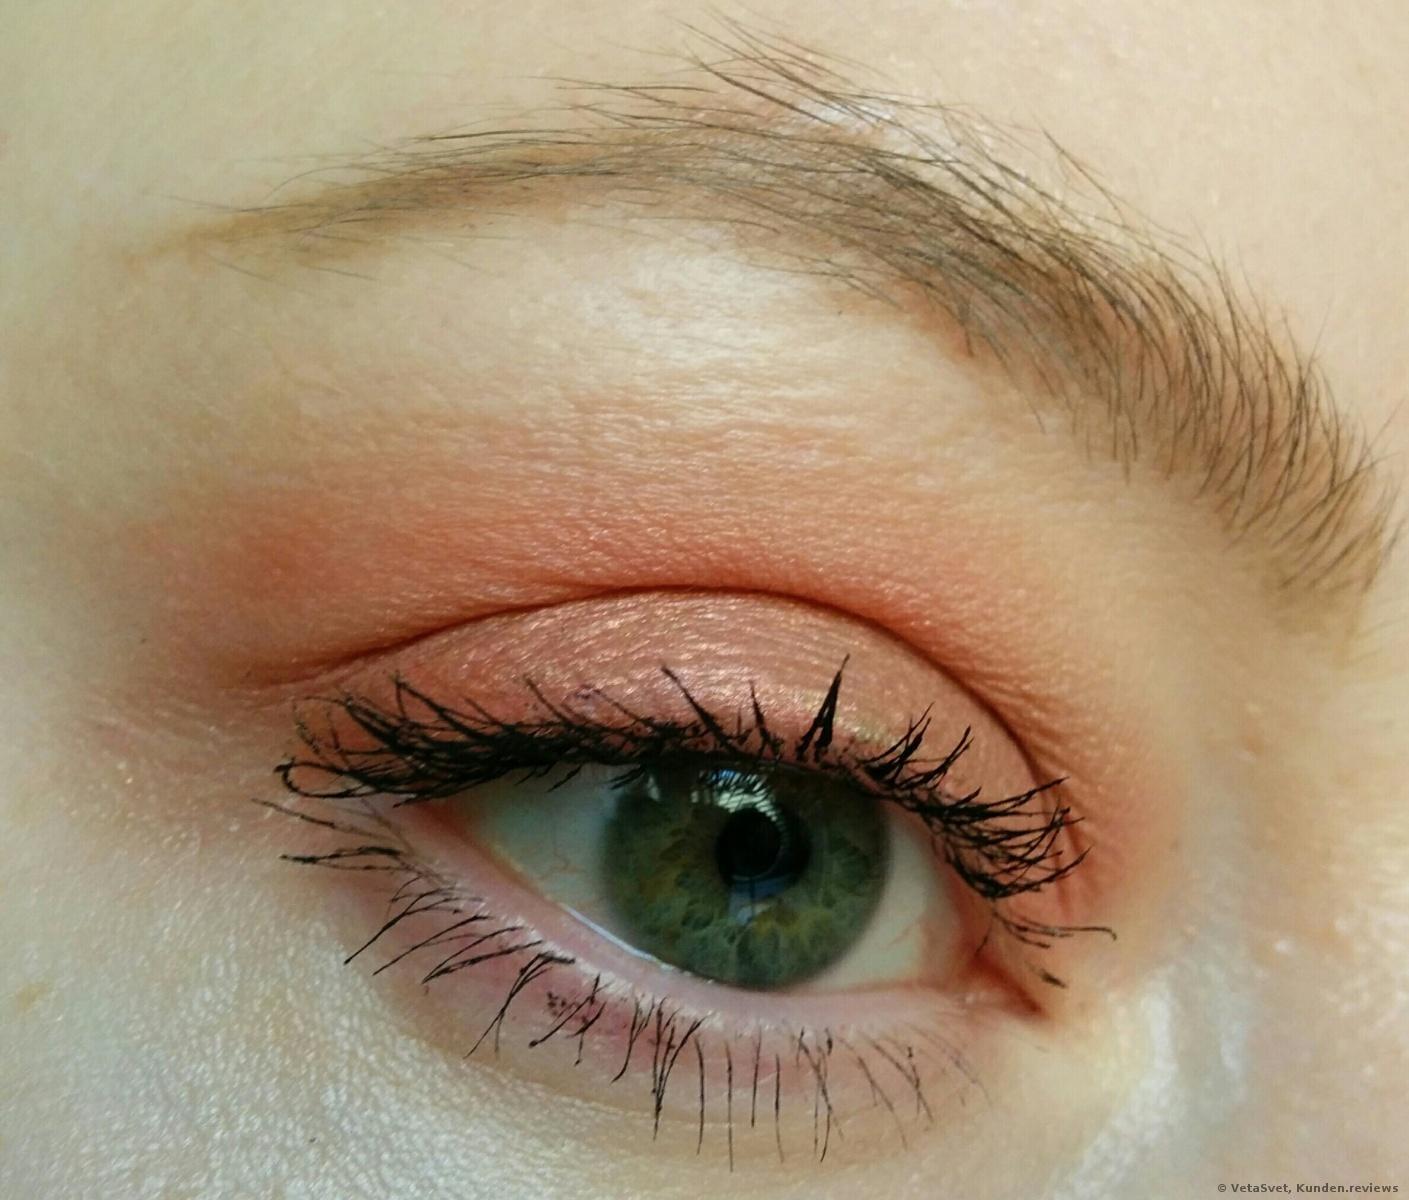 Urban Decay X Kristen Leanne Daydream Eyeshadow Palette